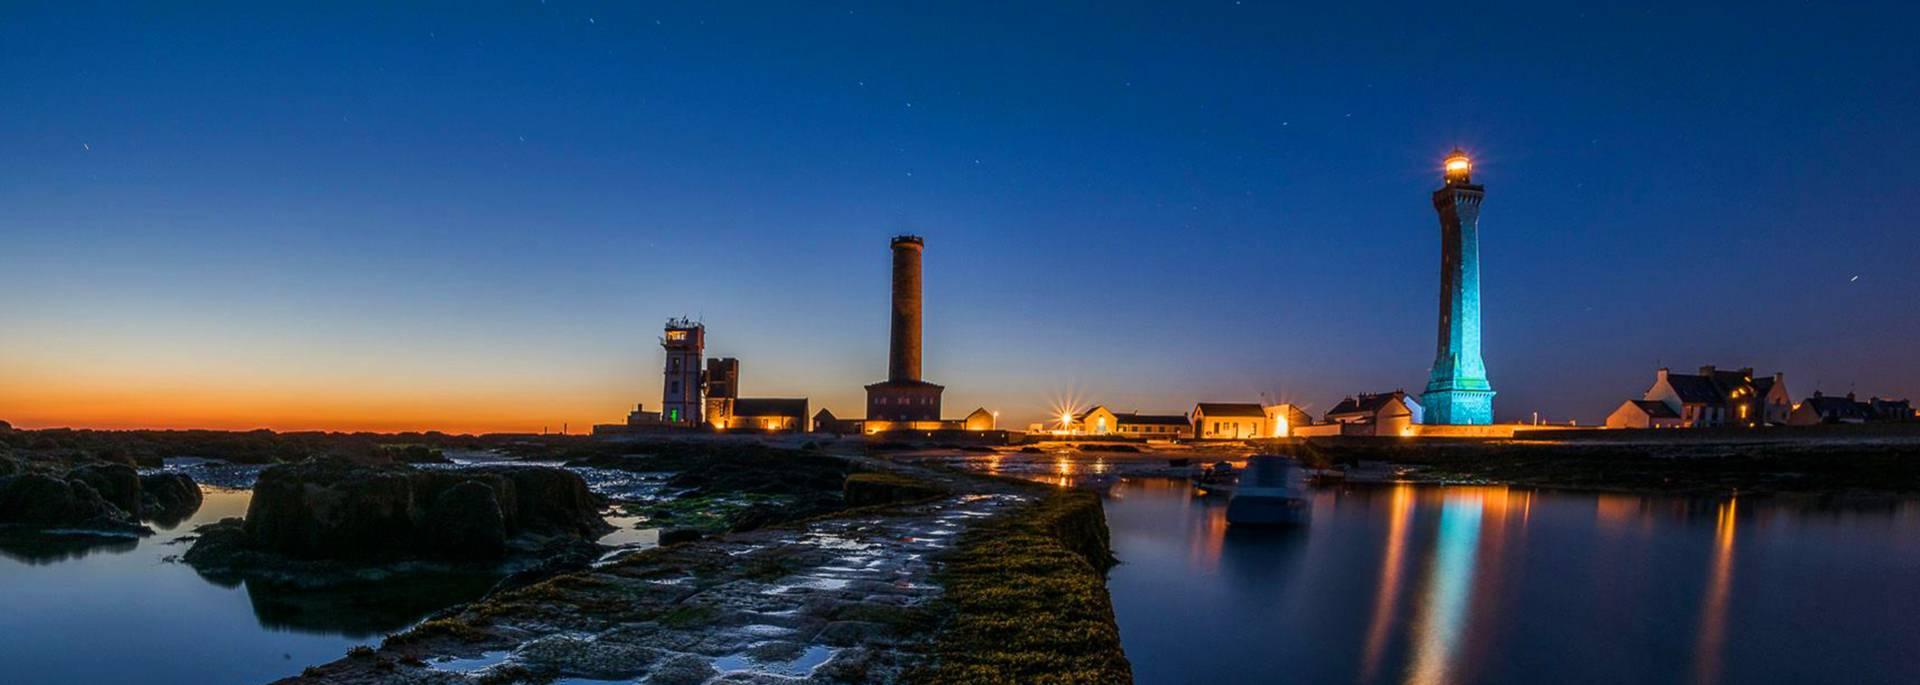 Eckmuhl lighthouse by night- Pays Bigouden © Liz Bourdon